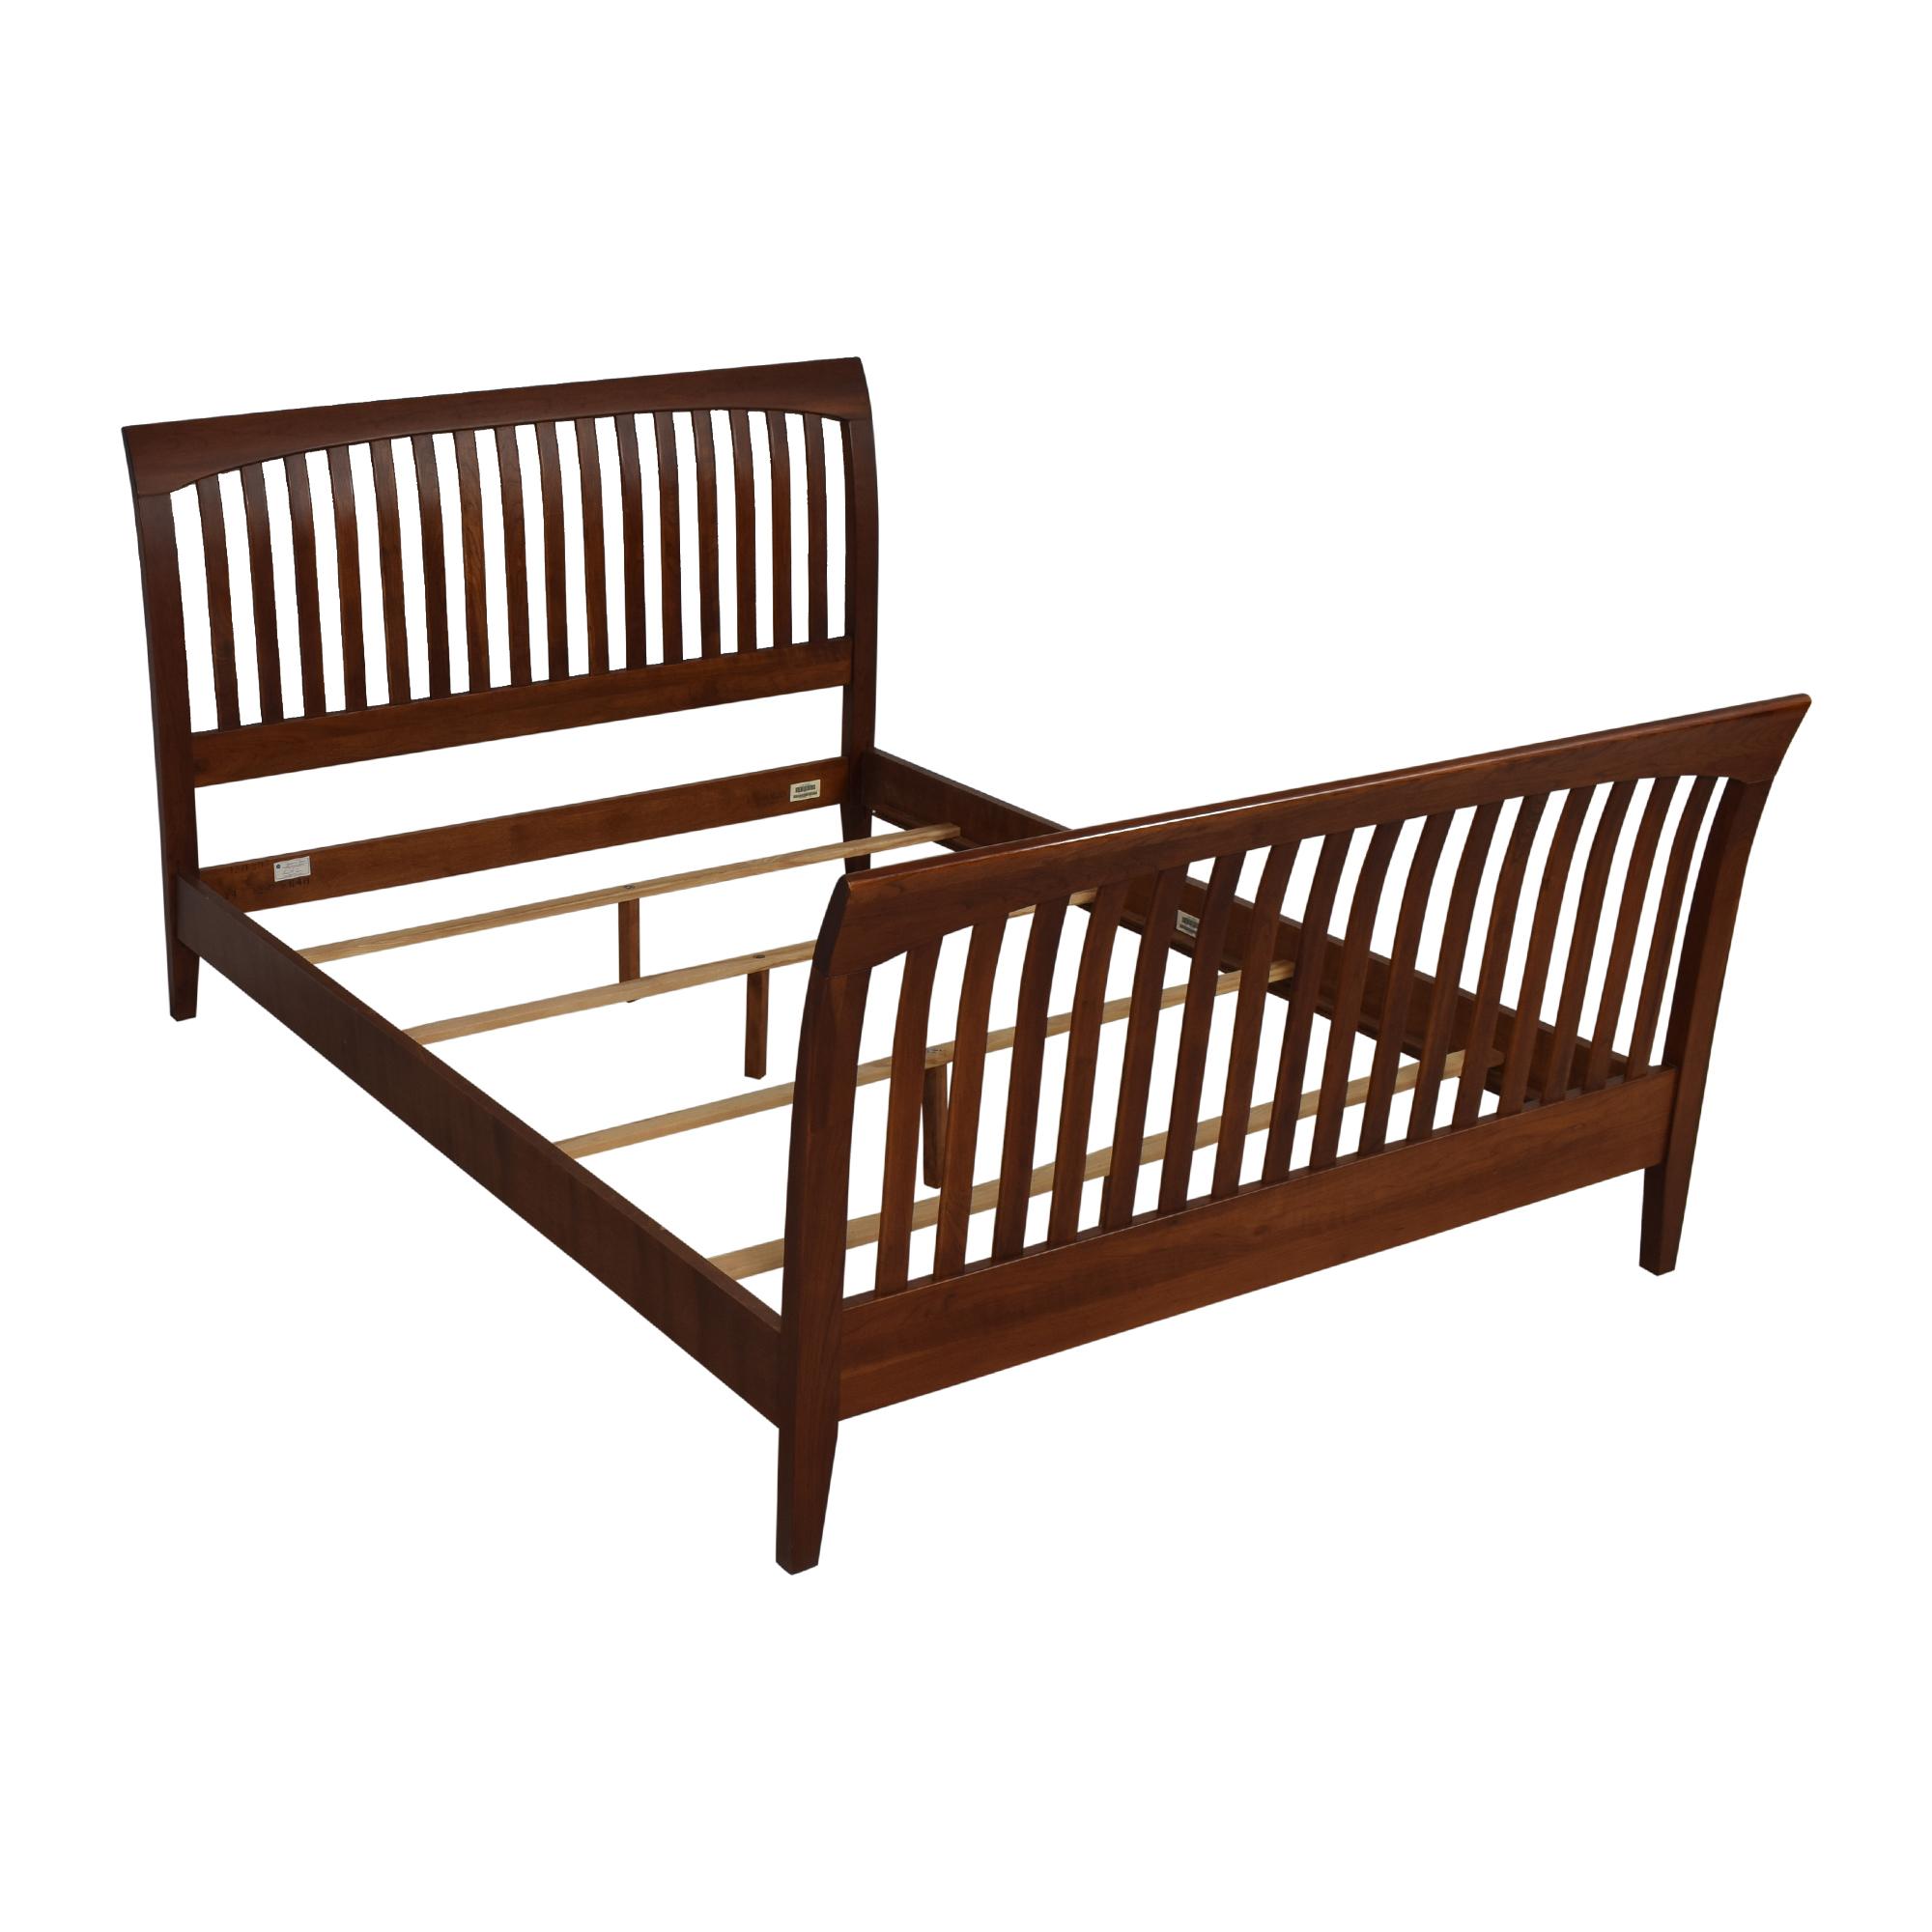 Ethan Allen Ethan Allen American Impressions Queen Sleigh Bed Frame Bed Frames